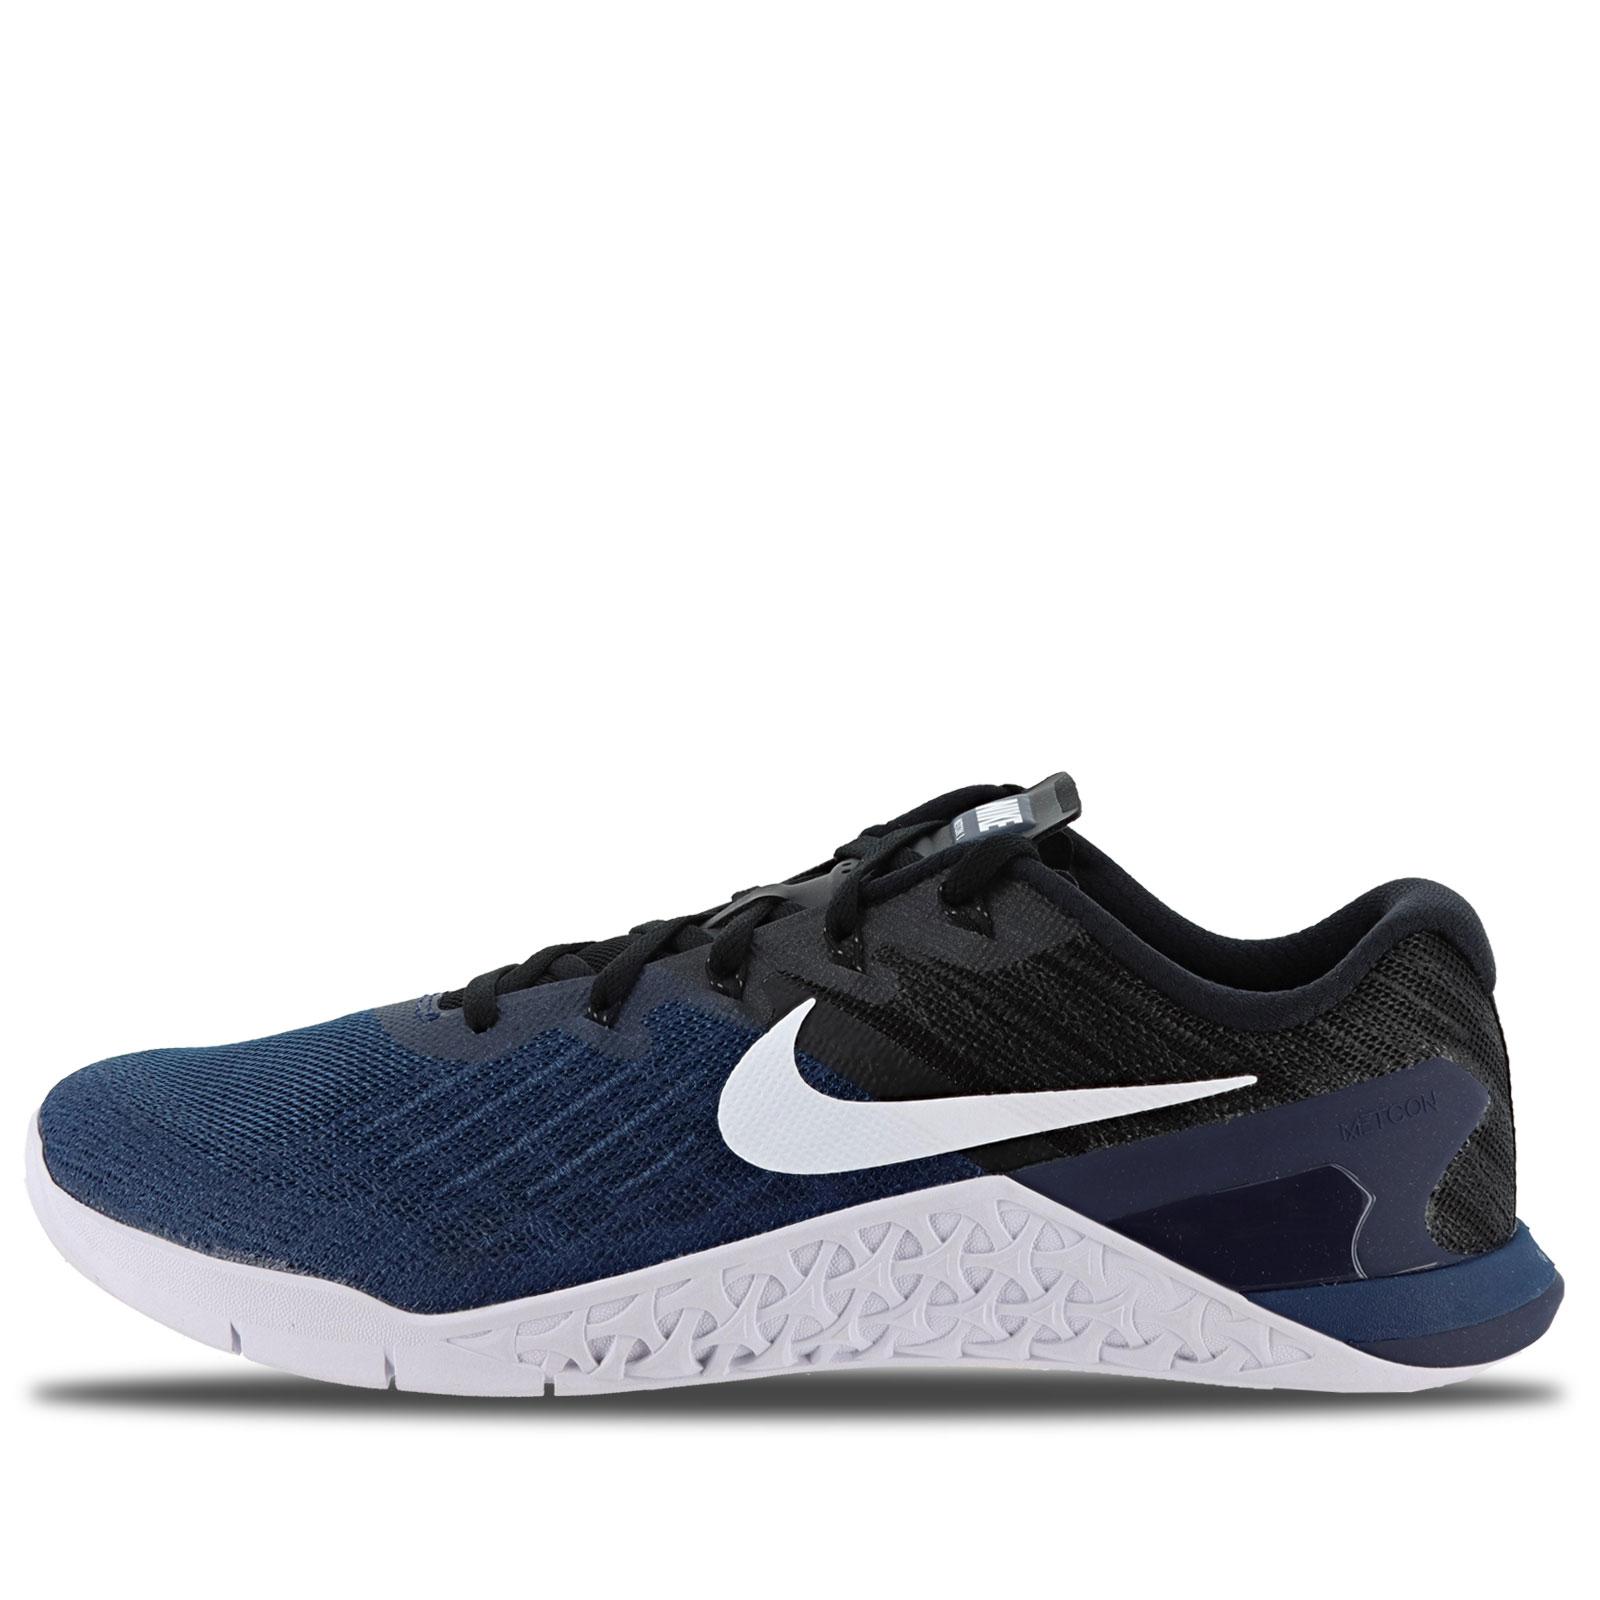 Men's Metcon 3 TB Nike Training Shoes